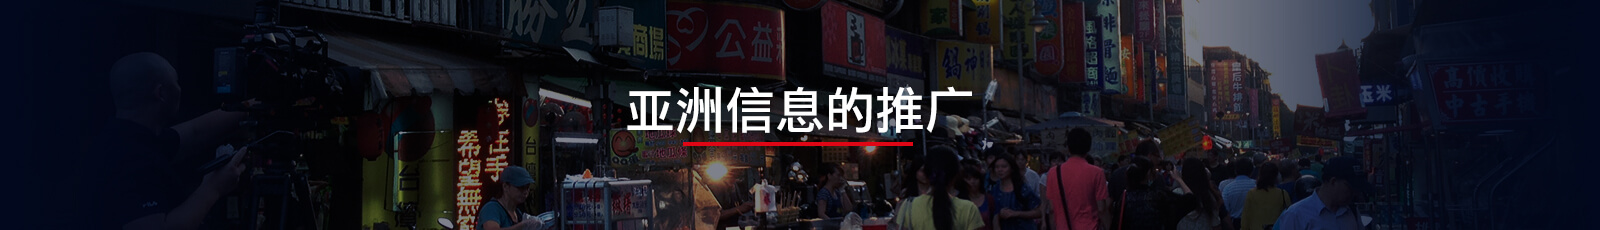 FLY MEDIA 亚洲信息的推广